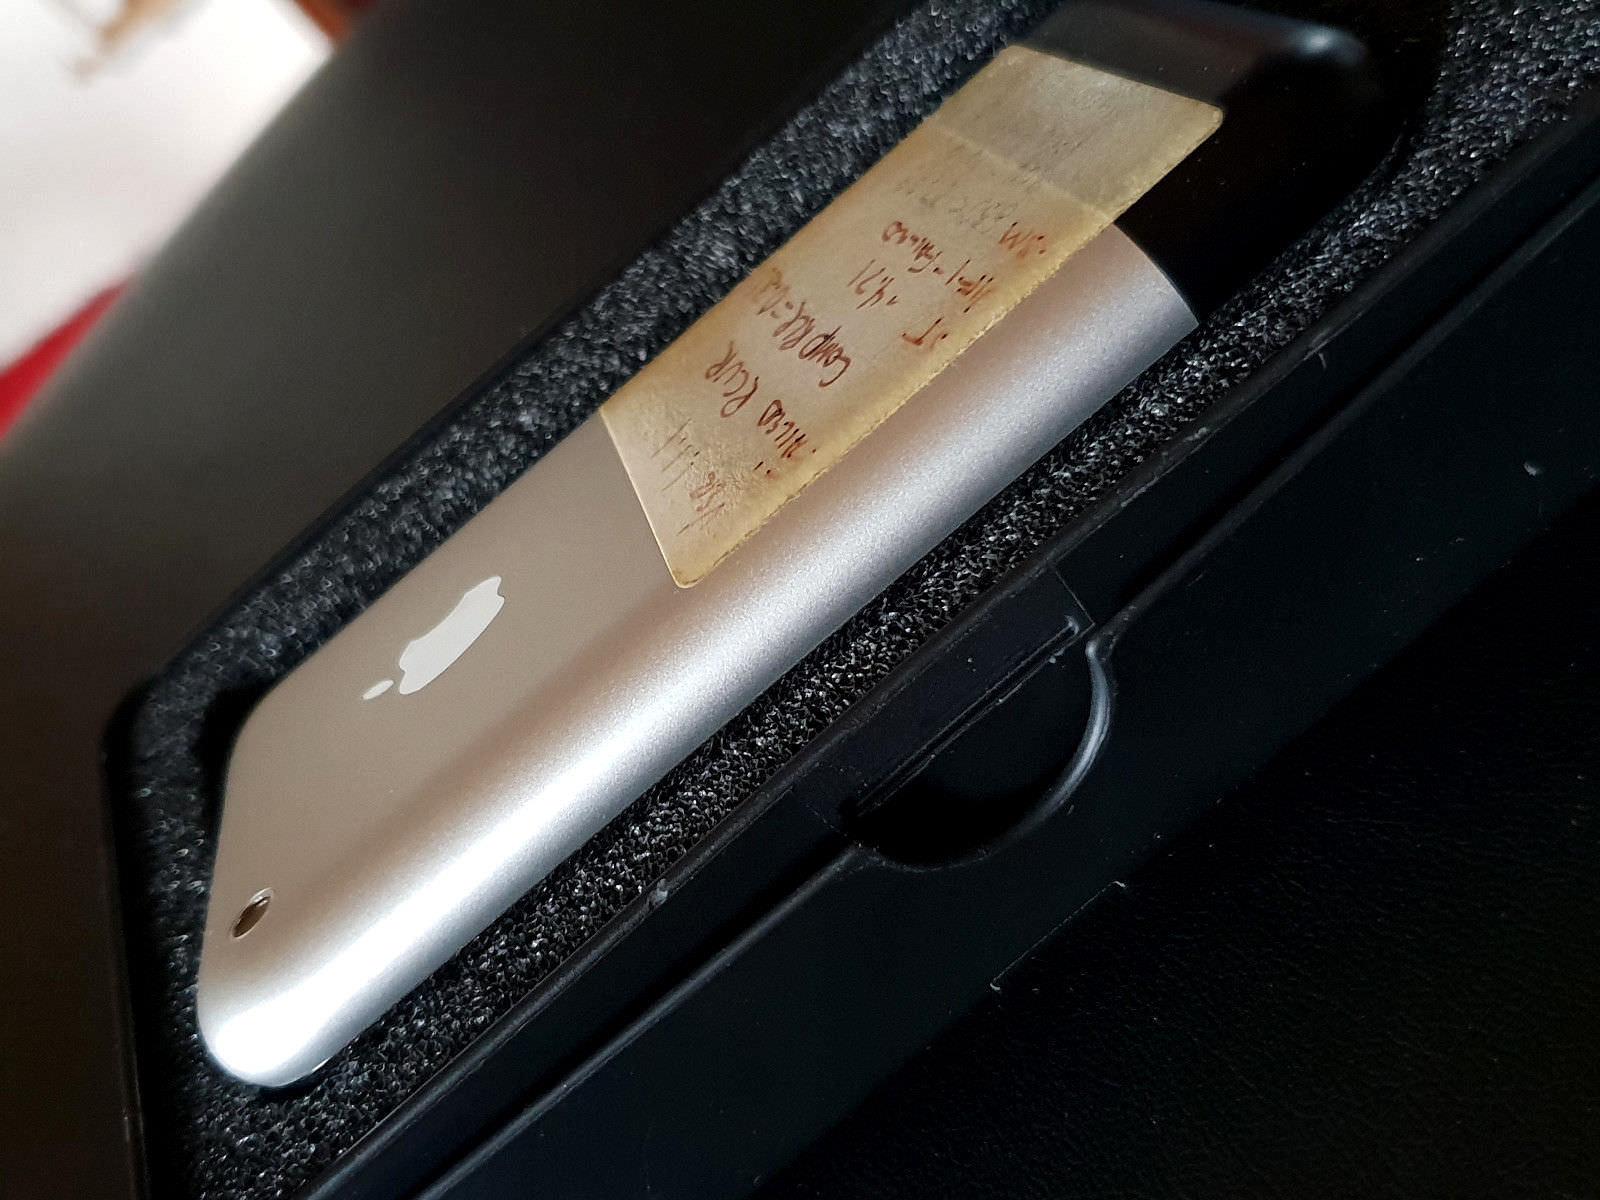 Prototype-Original-iPhone-on-ebay-2-4.jpg